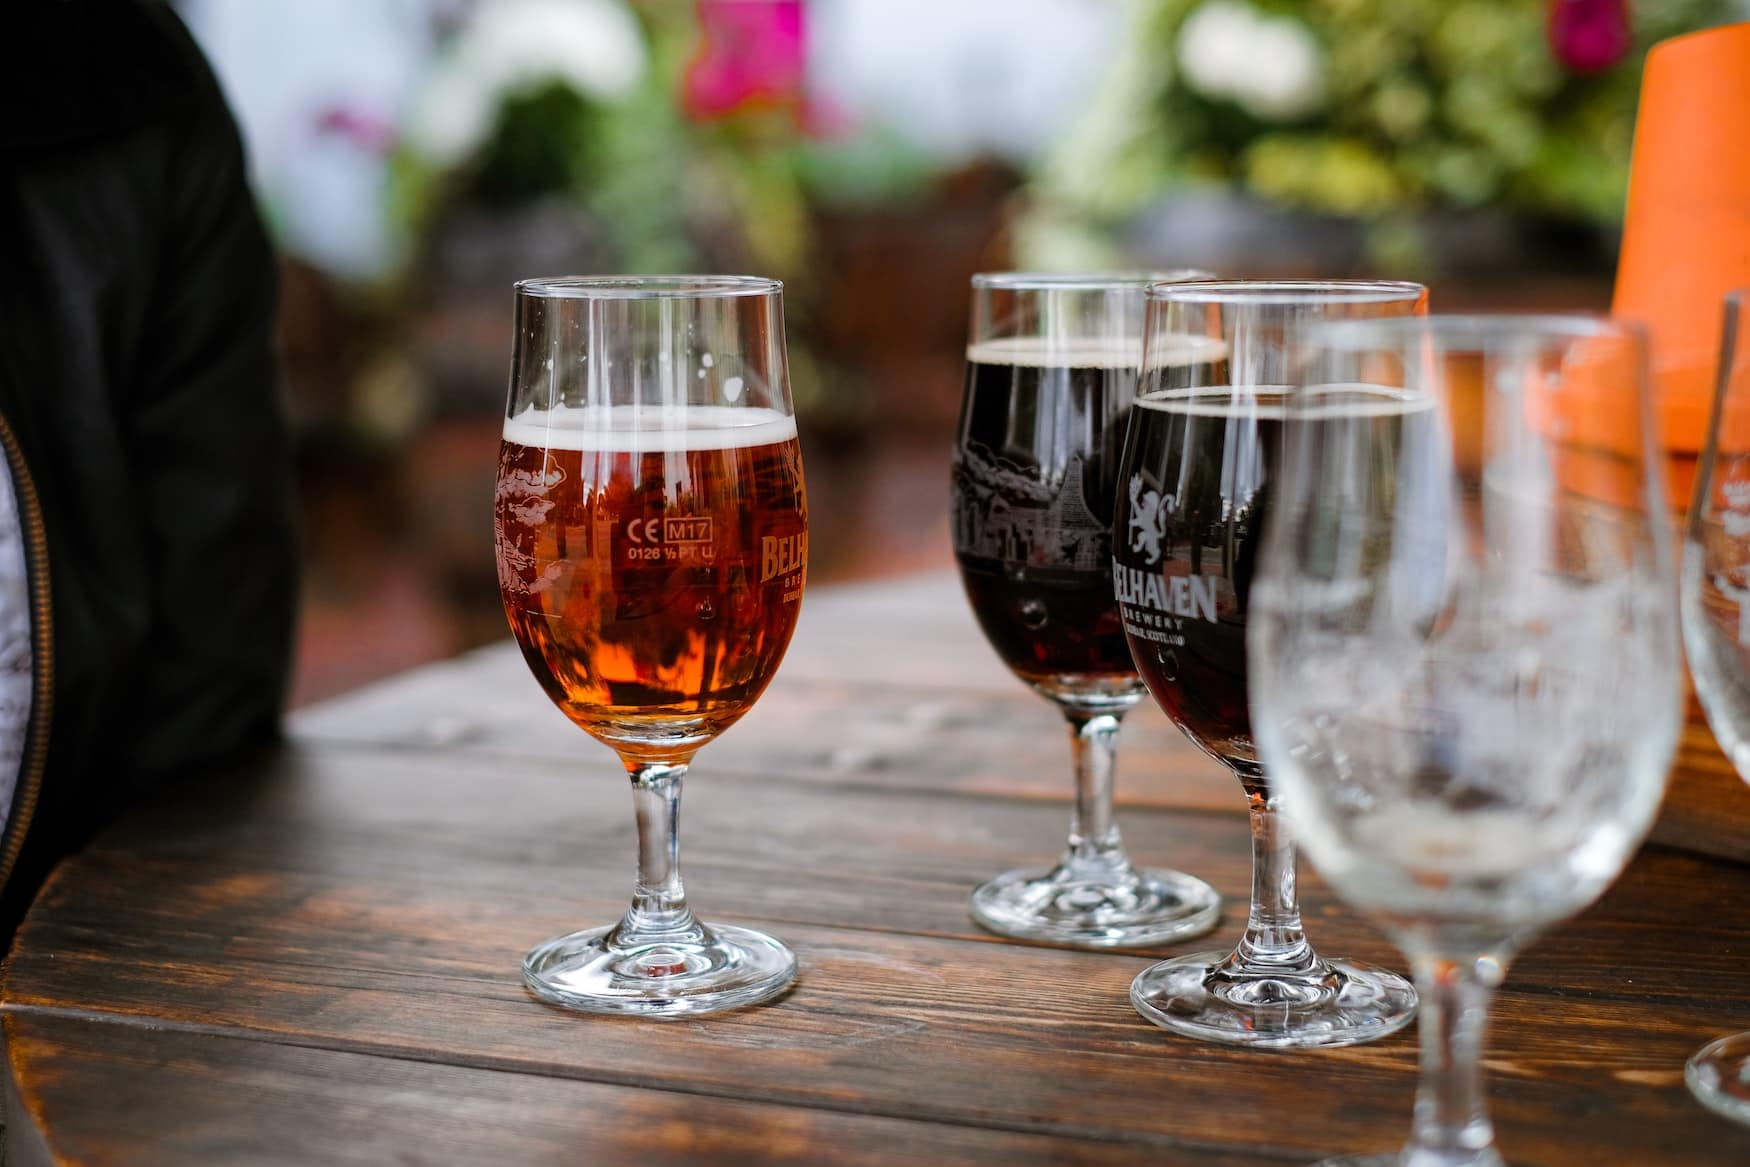 Andere Länder, andere Sitten: Große Biergläser in Pub in England